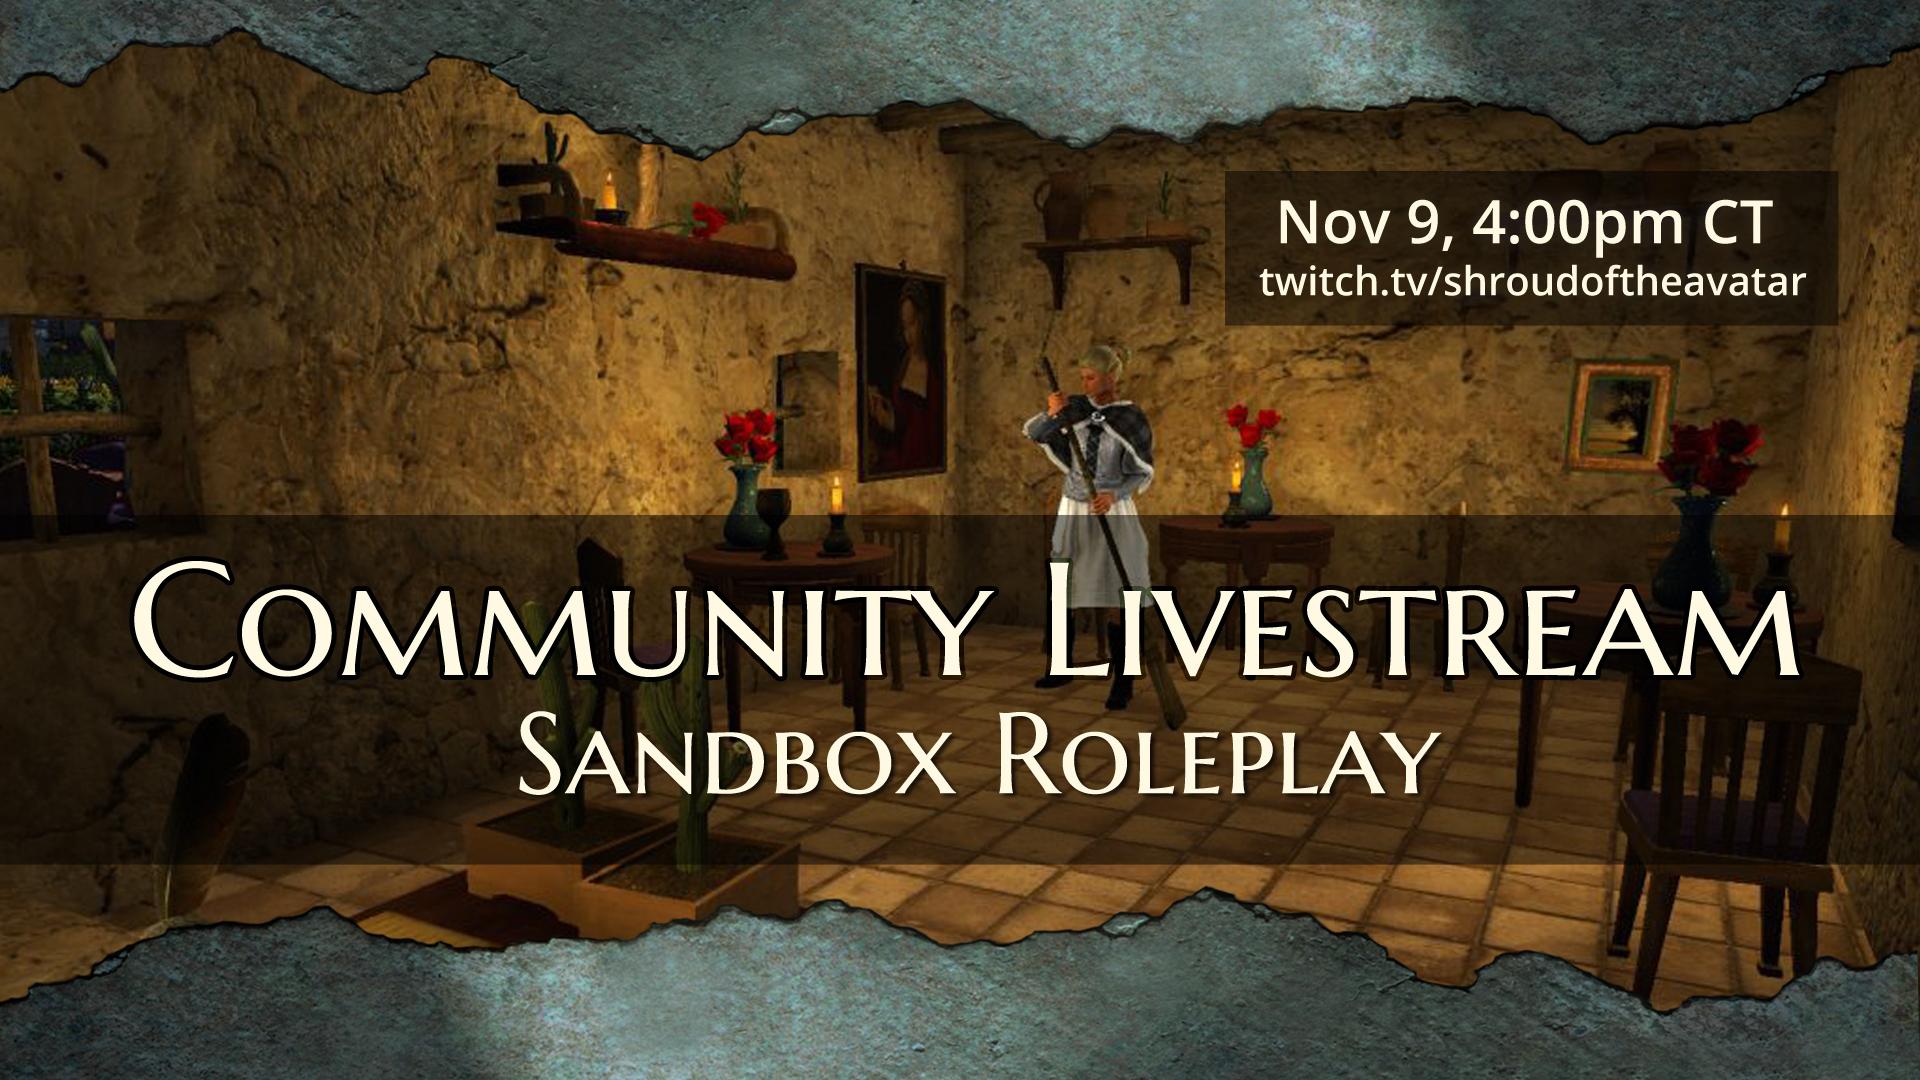 Avatar's Update #305: Sandbox Livestream Today & R60 on QA